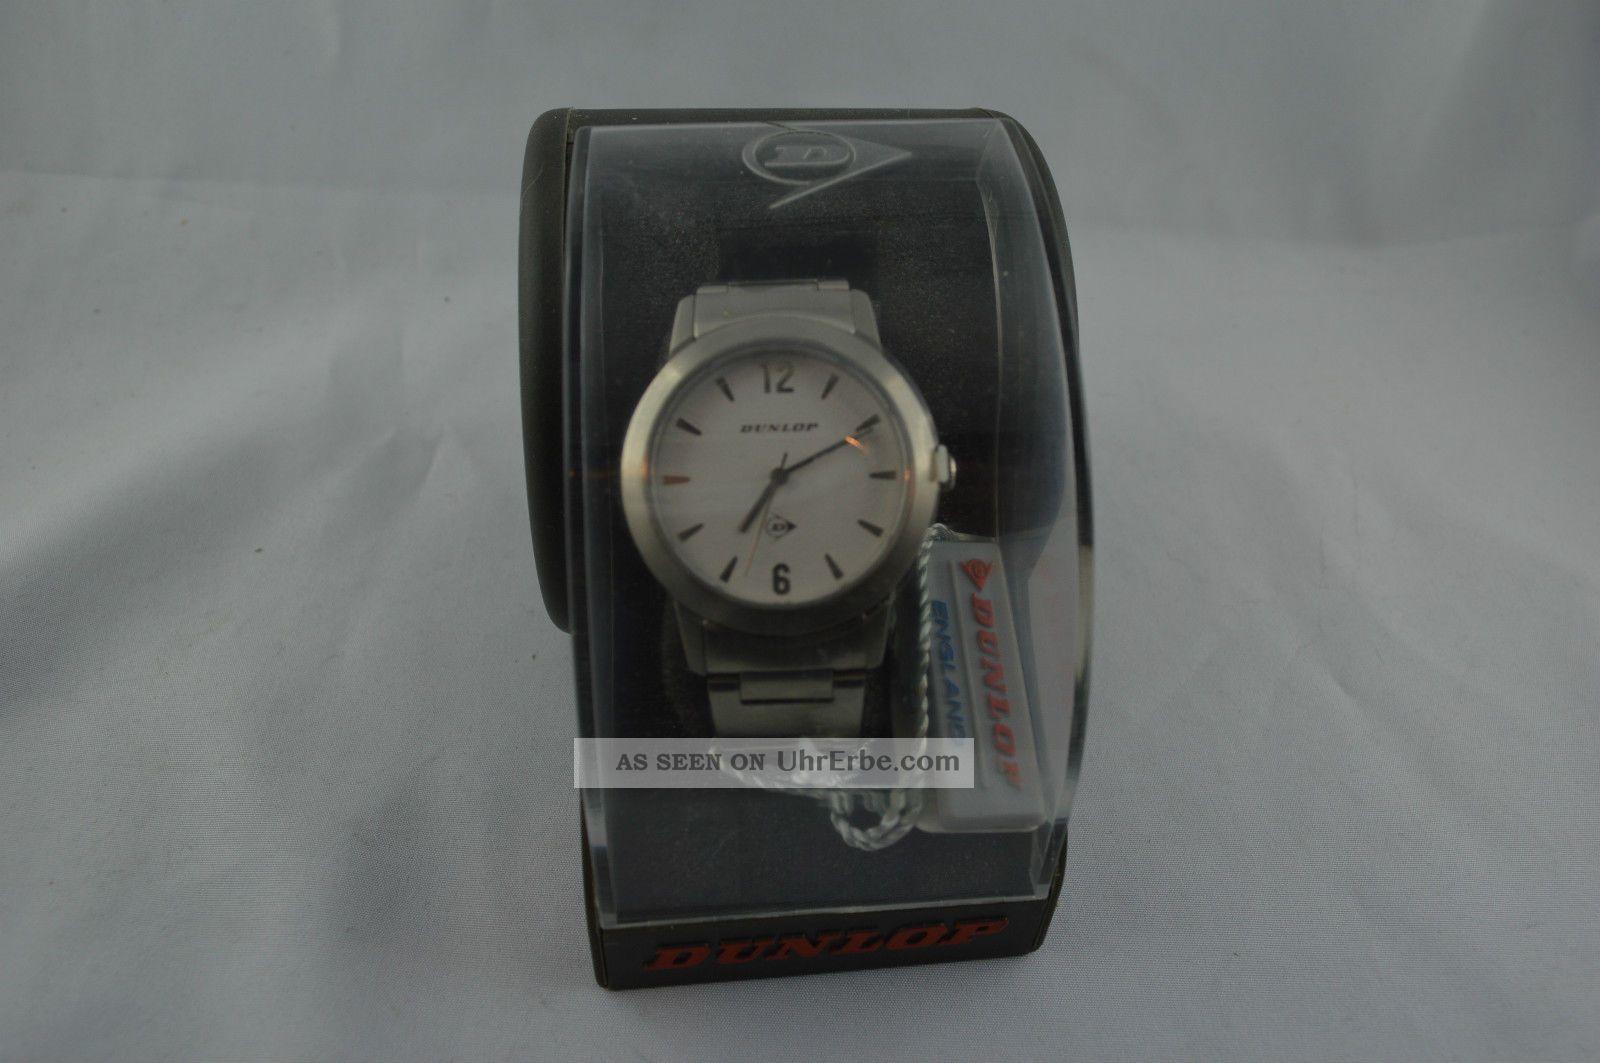 Armbanduhr Dunlop D217 Tour Ungetragen Analog Metall Armbanduhren Bild